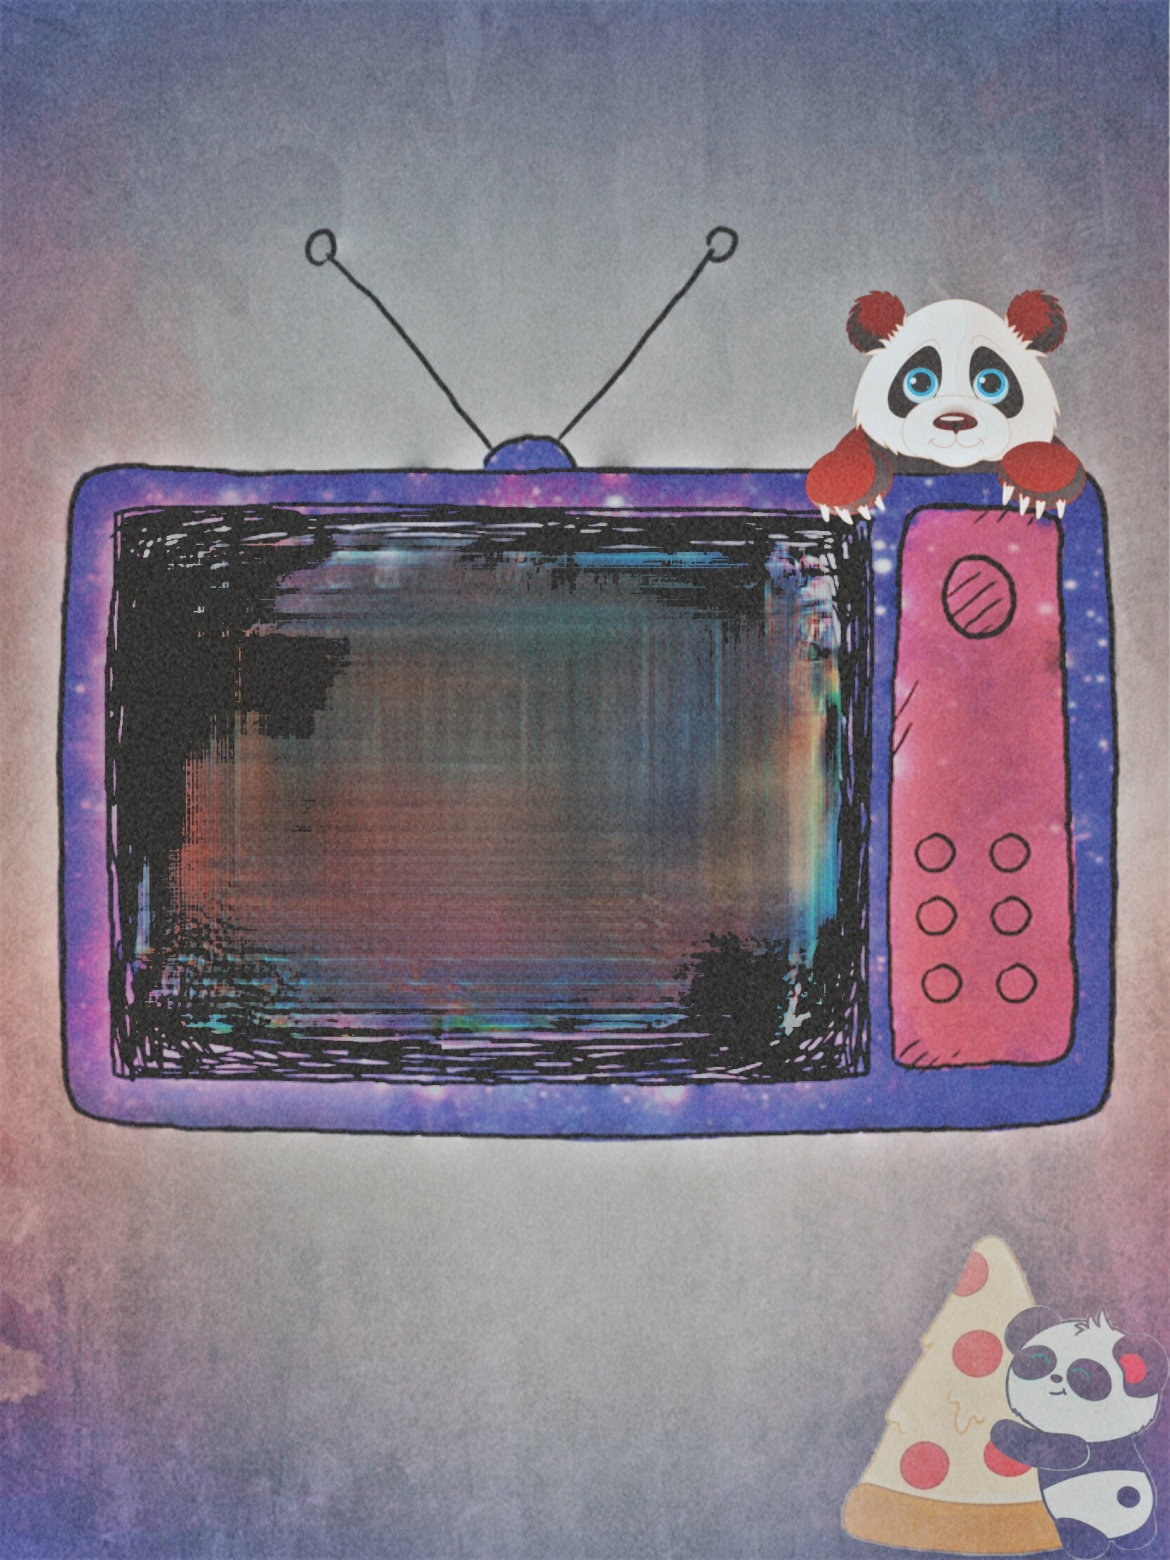 PandaVision